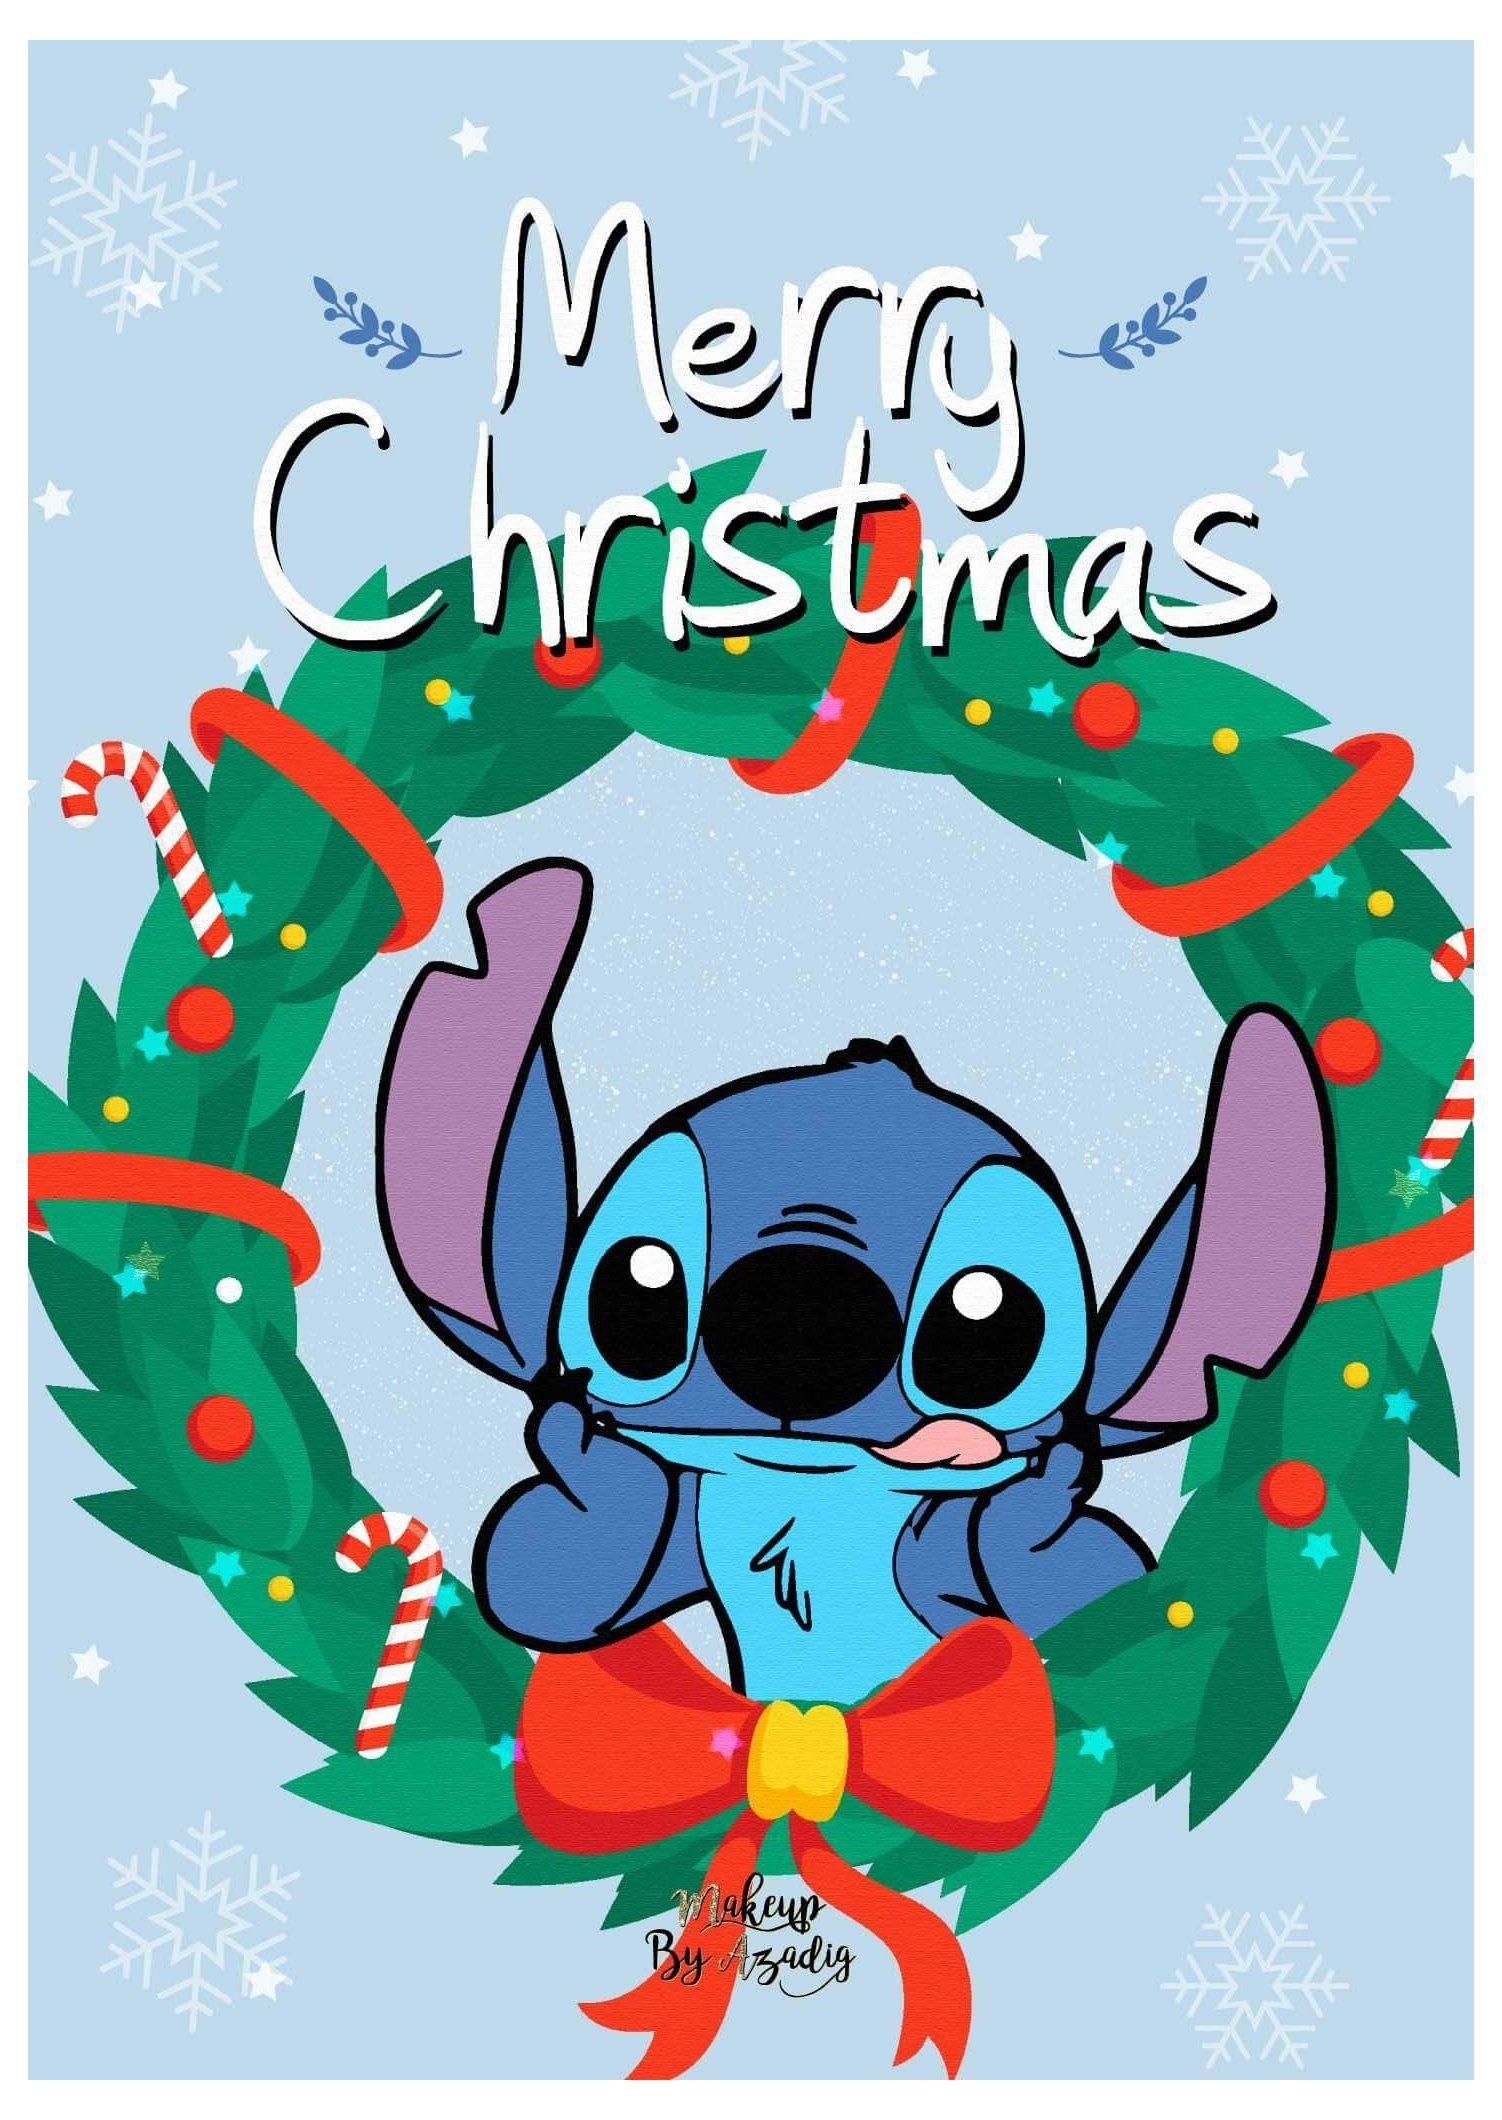 9 Fond Dcran Disney Stitch Christmas Stitch Wallpaper Iphone Christmas Cute Disney Wallpaper Christmas Wallpaper